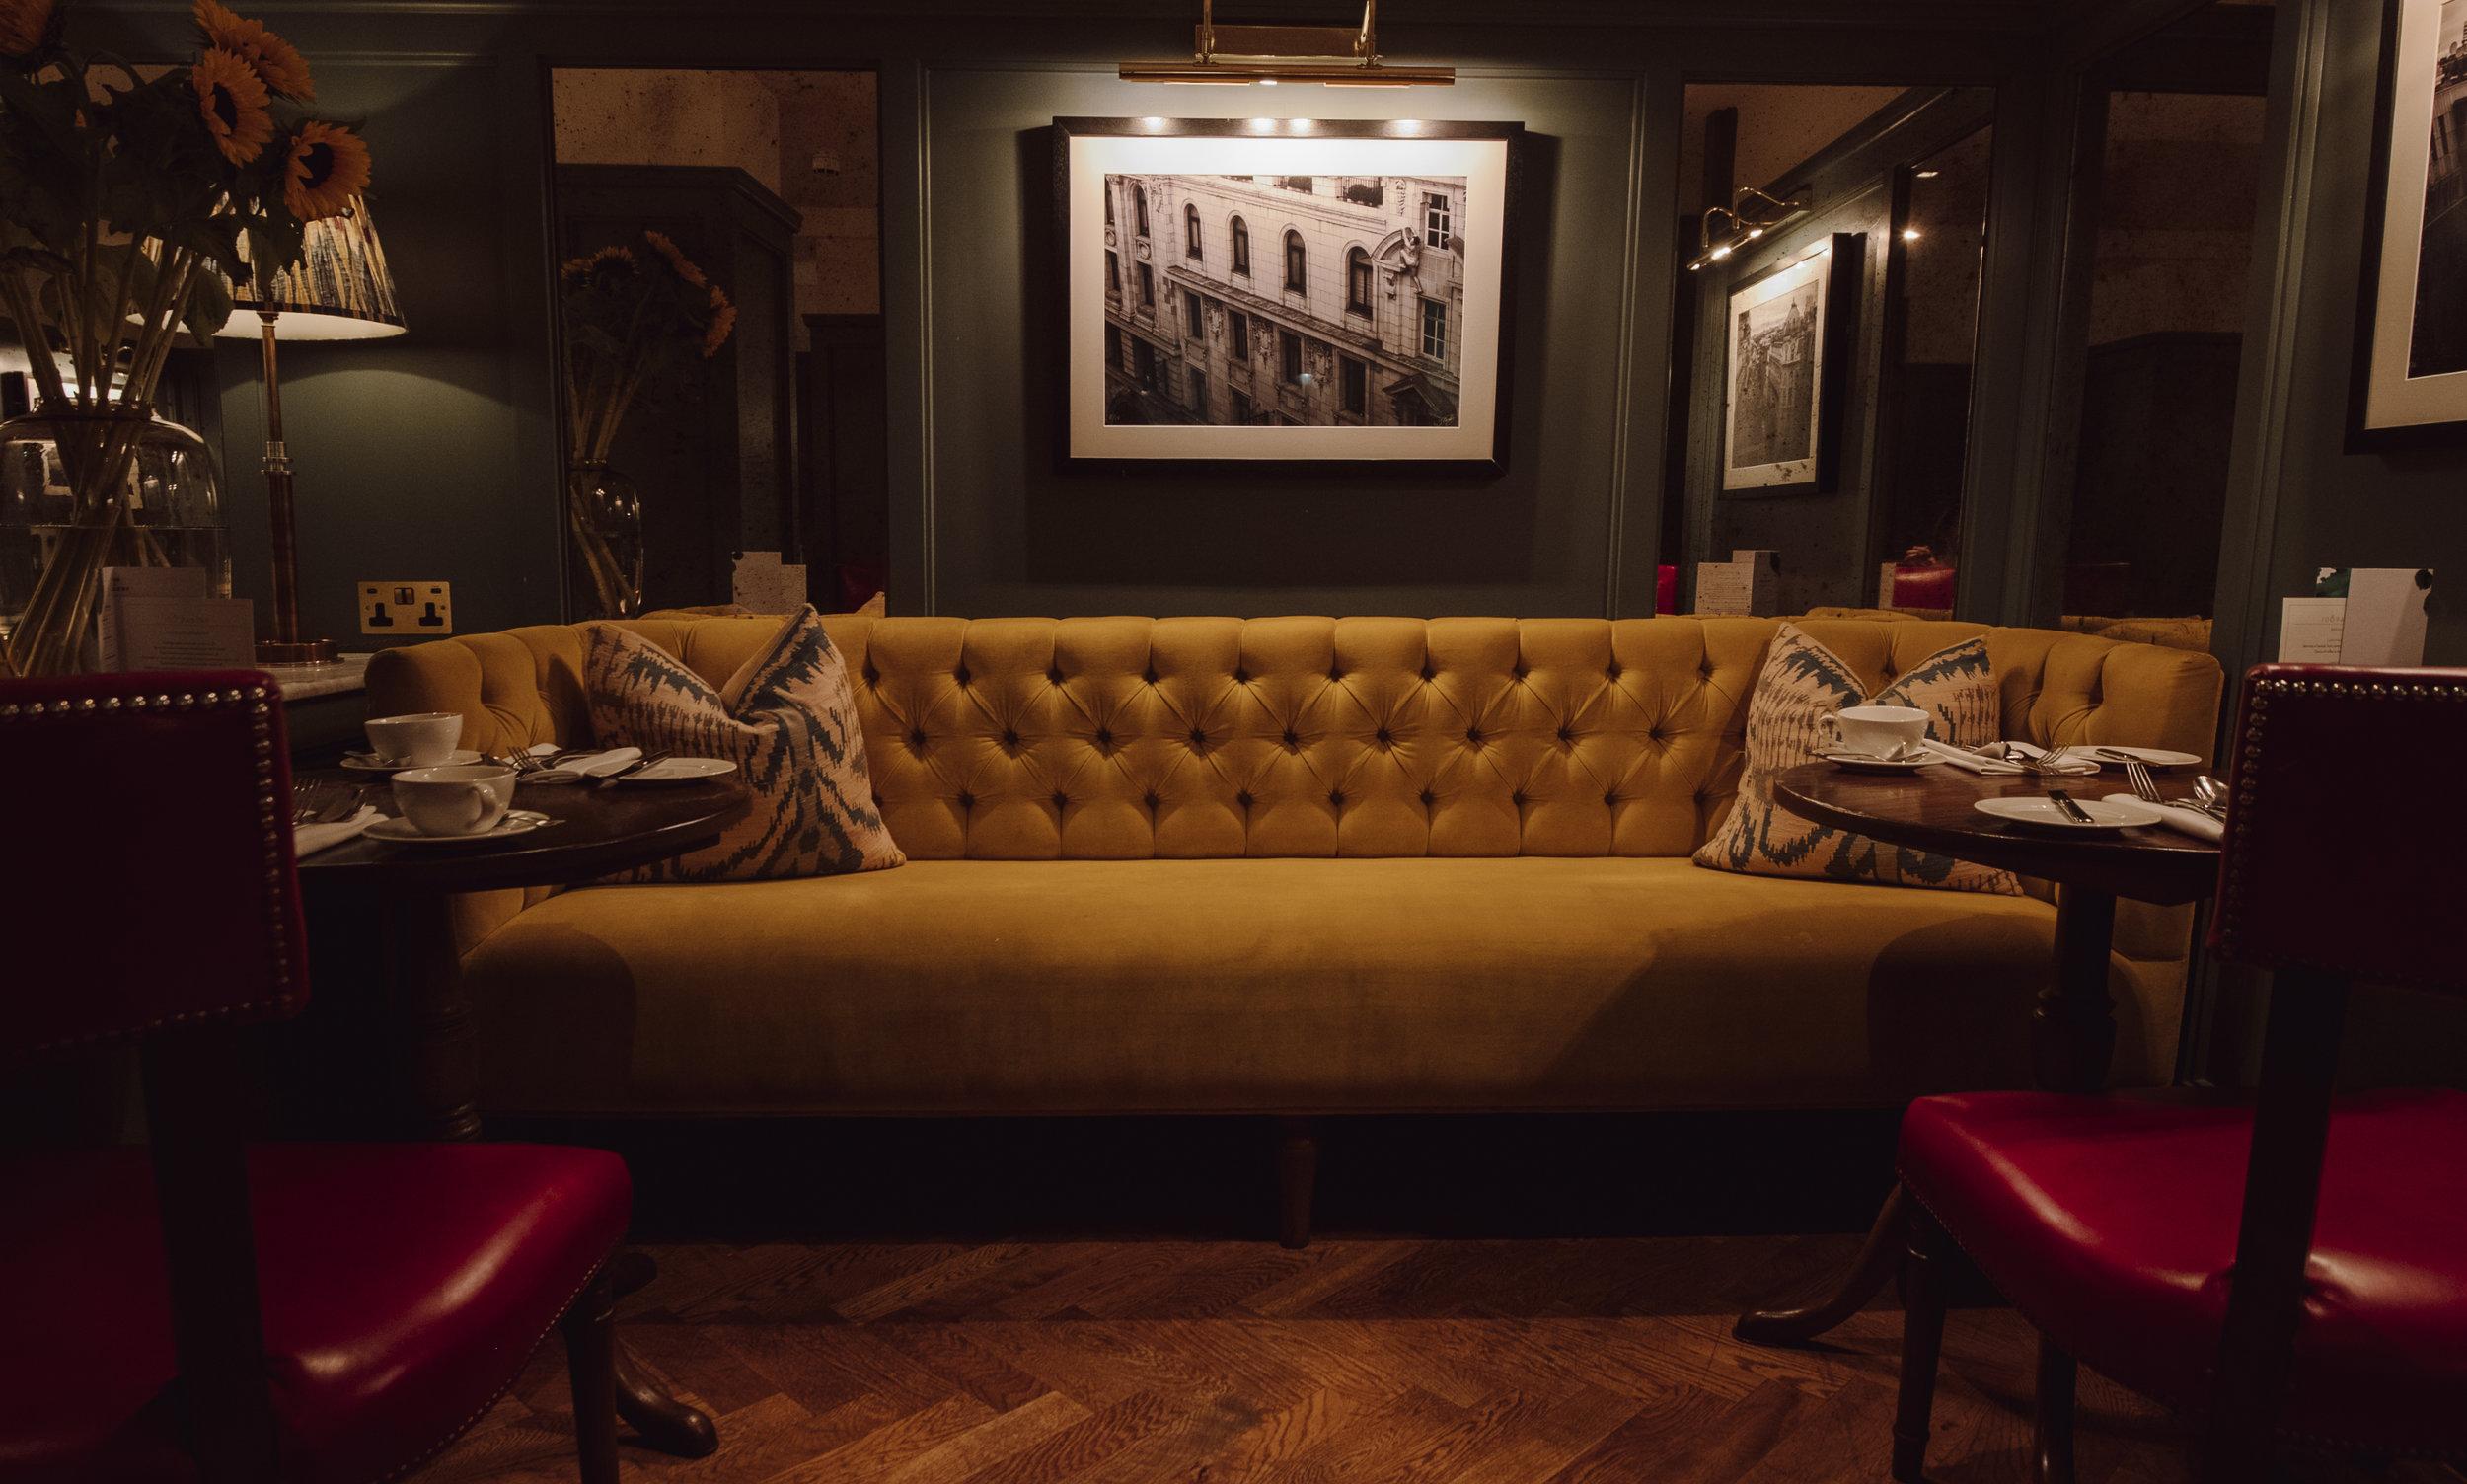 Hotel Marylebone | Nicole Bissey Photography 09.JPG